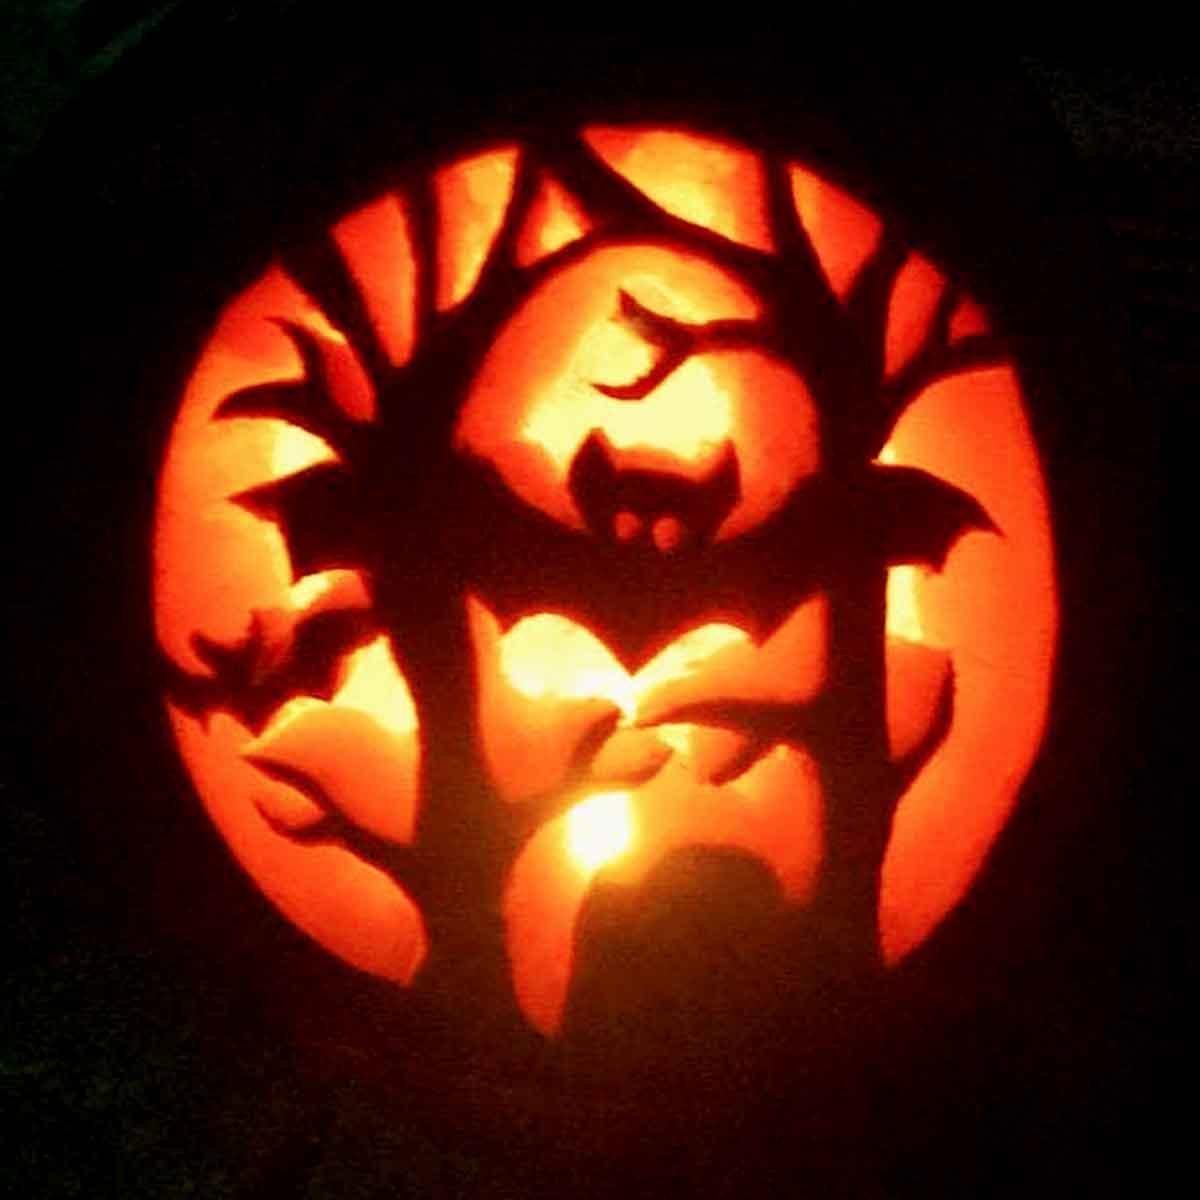 35 Advanced Challenging Pumpkin Carving Ideas 2020 For Adults Grownups Designbolts